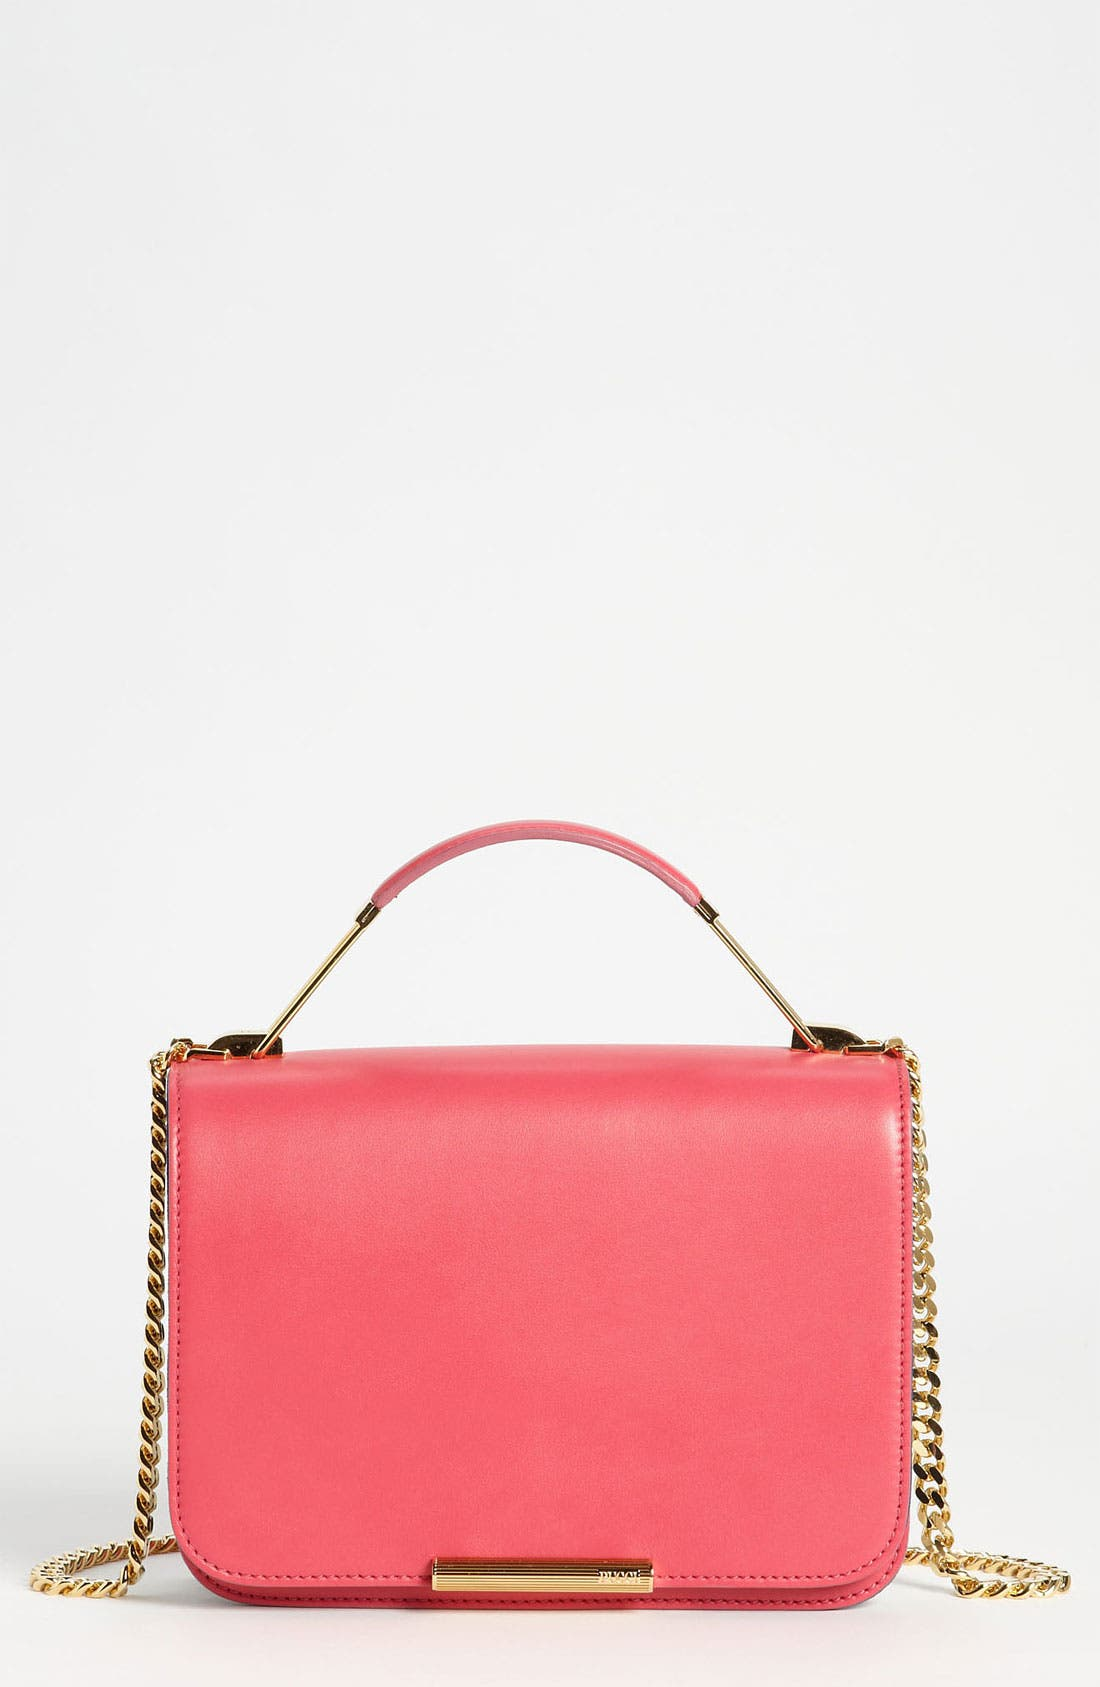 Main Image - Emilio Pucci Partitioned Leather Shoulder Bag